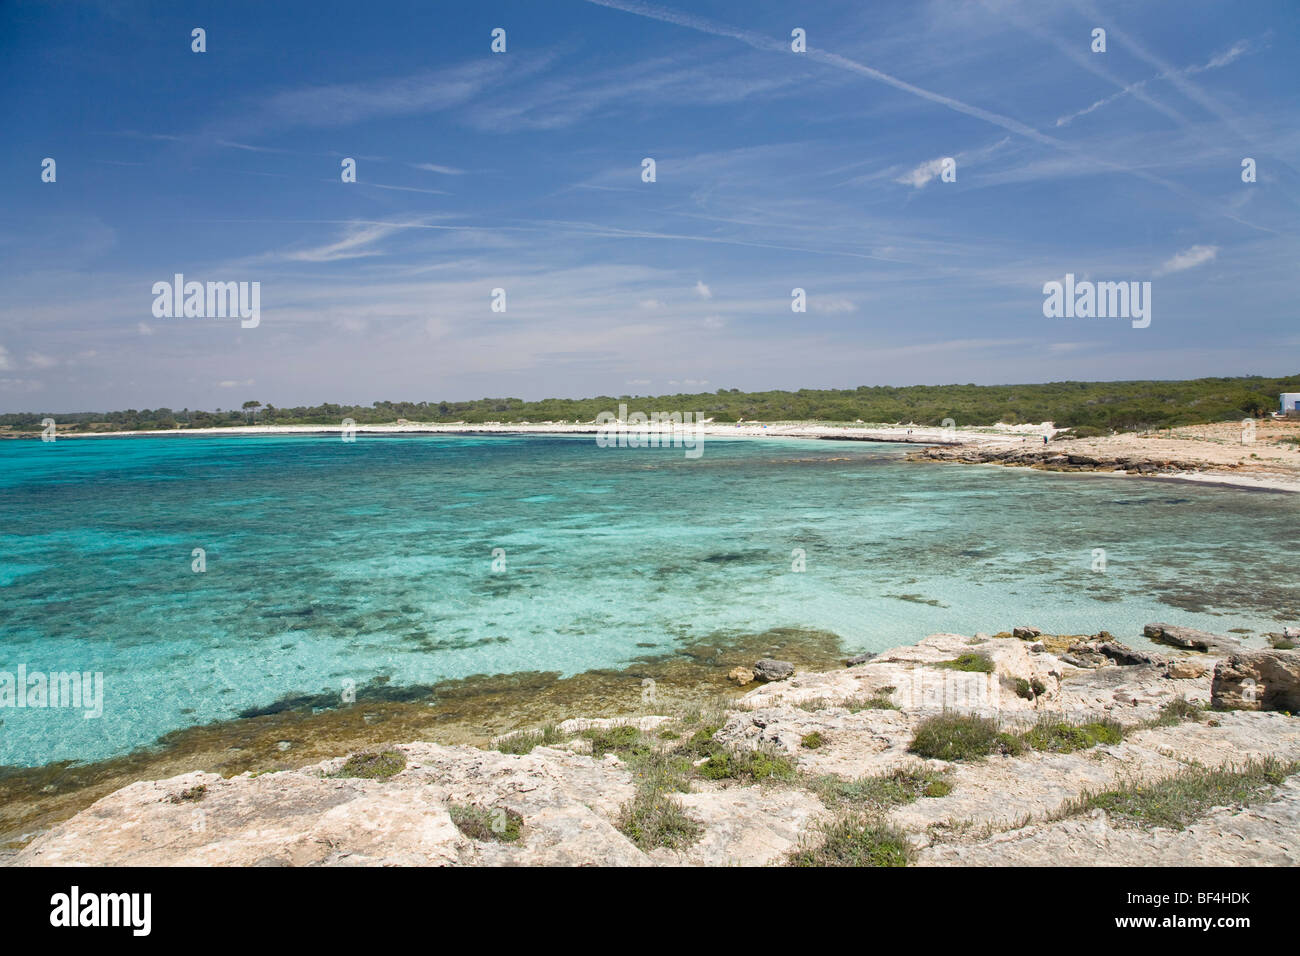 Beach Platja d'es Caragol, Mallorca, Majorca, Balearic Islands, Mediterranean Sea, Spain, Europe - Stock Image